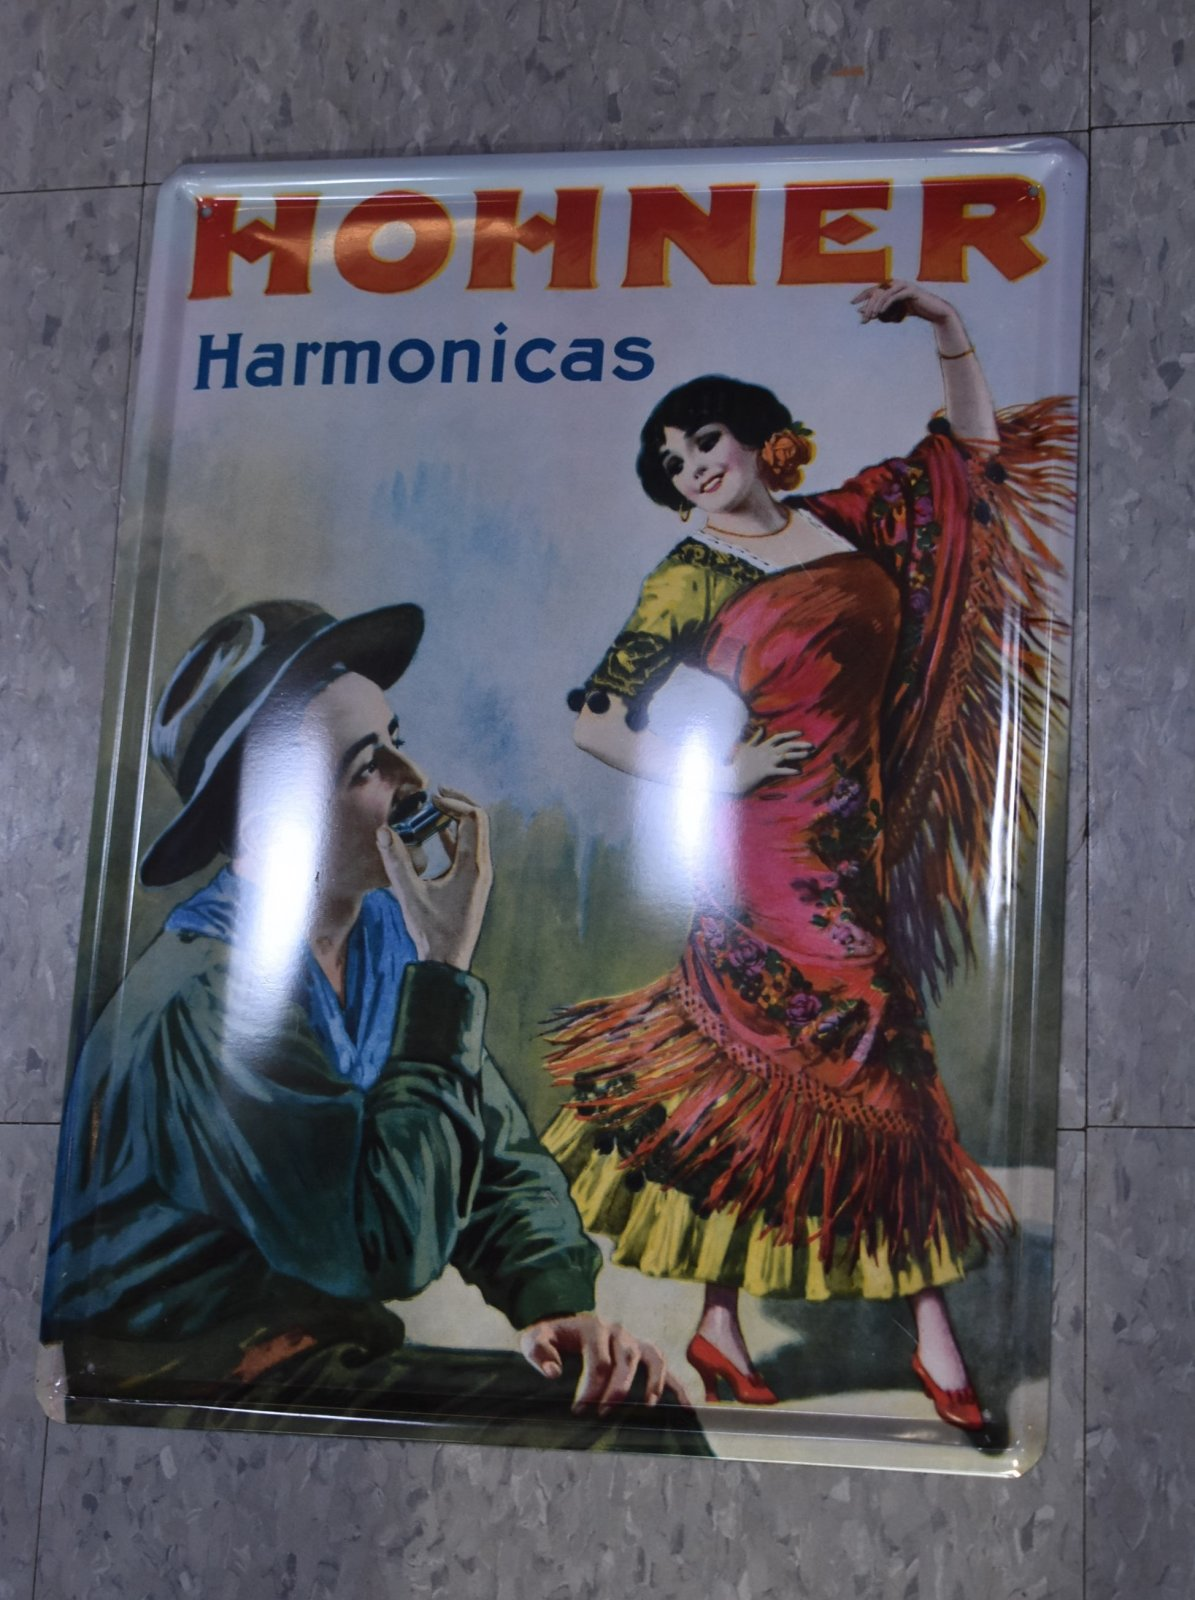 Hohner Harmonicas Metal Sign